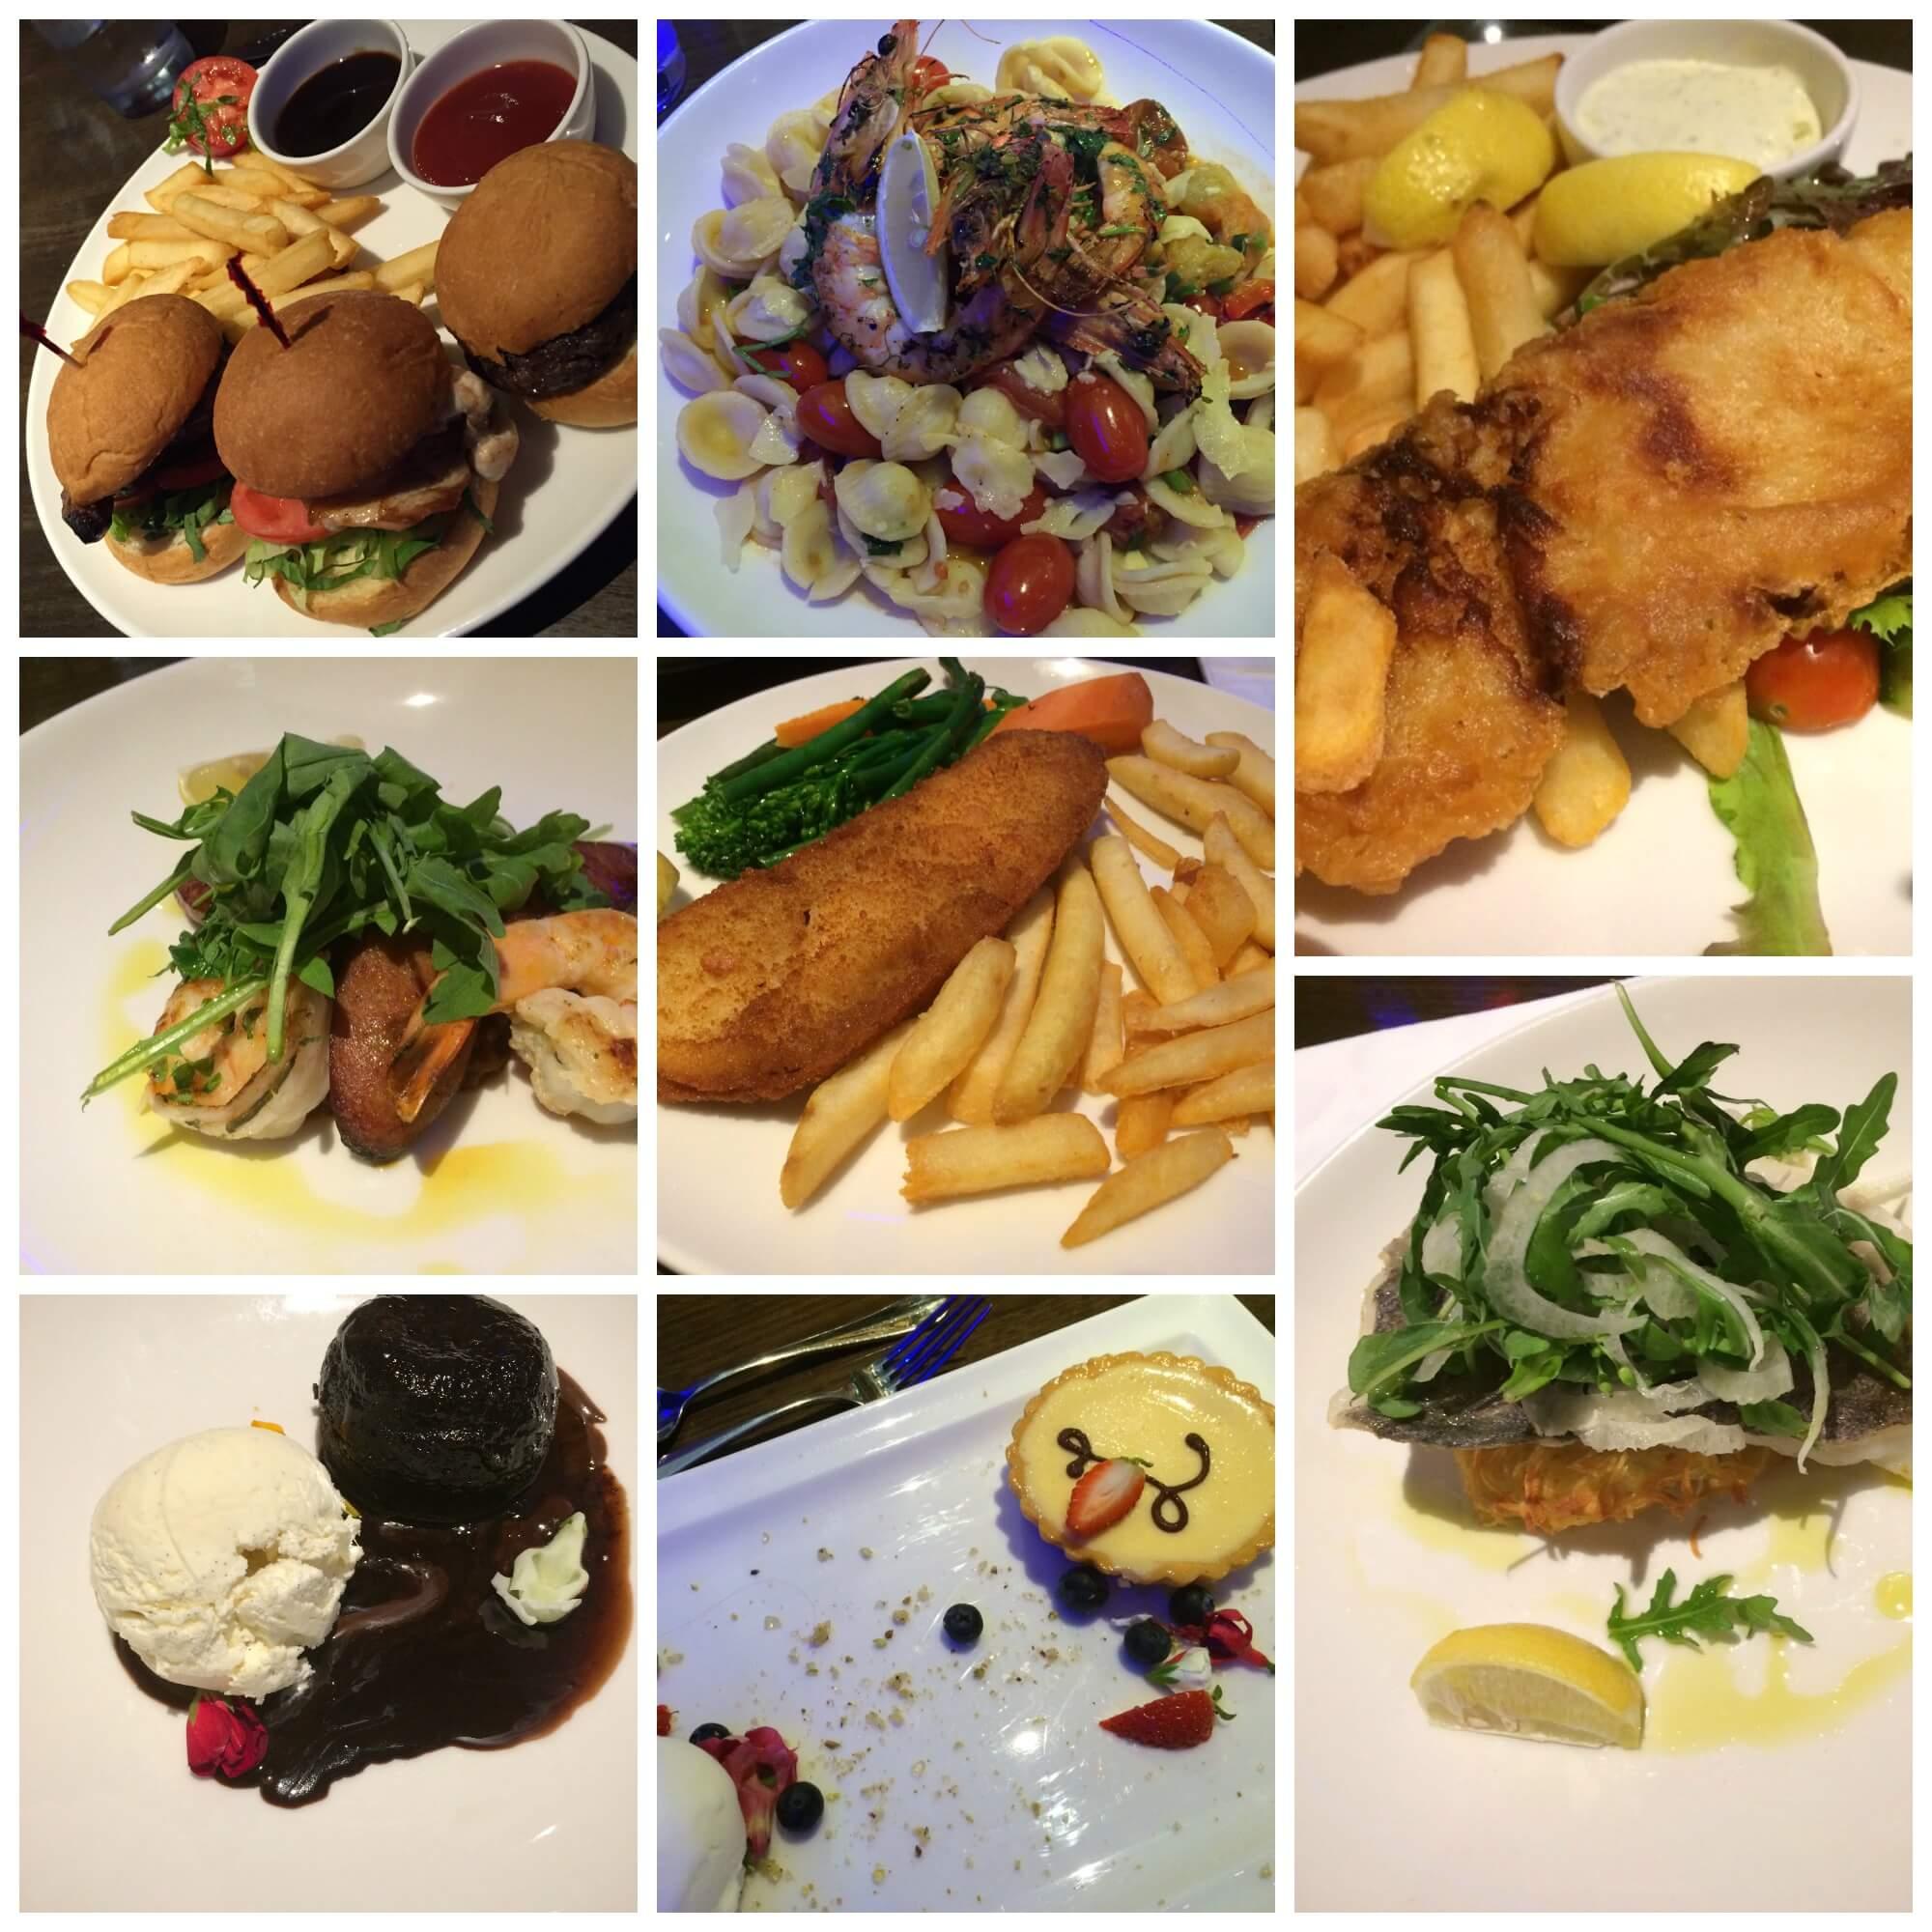 Novotel Canberra dinner